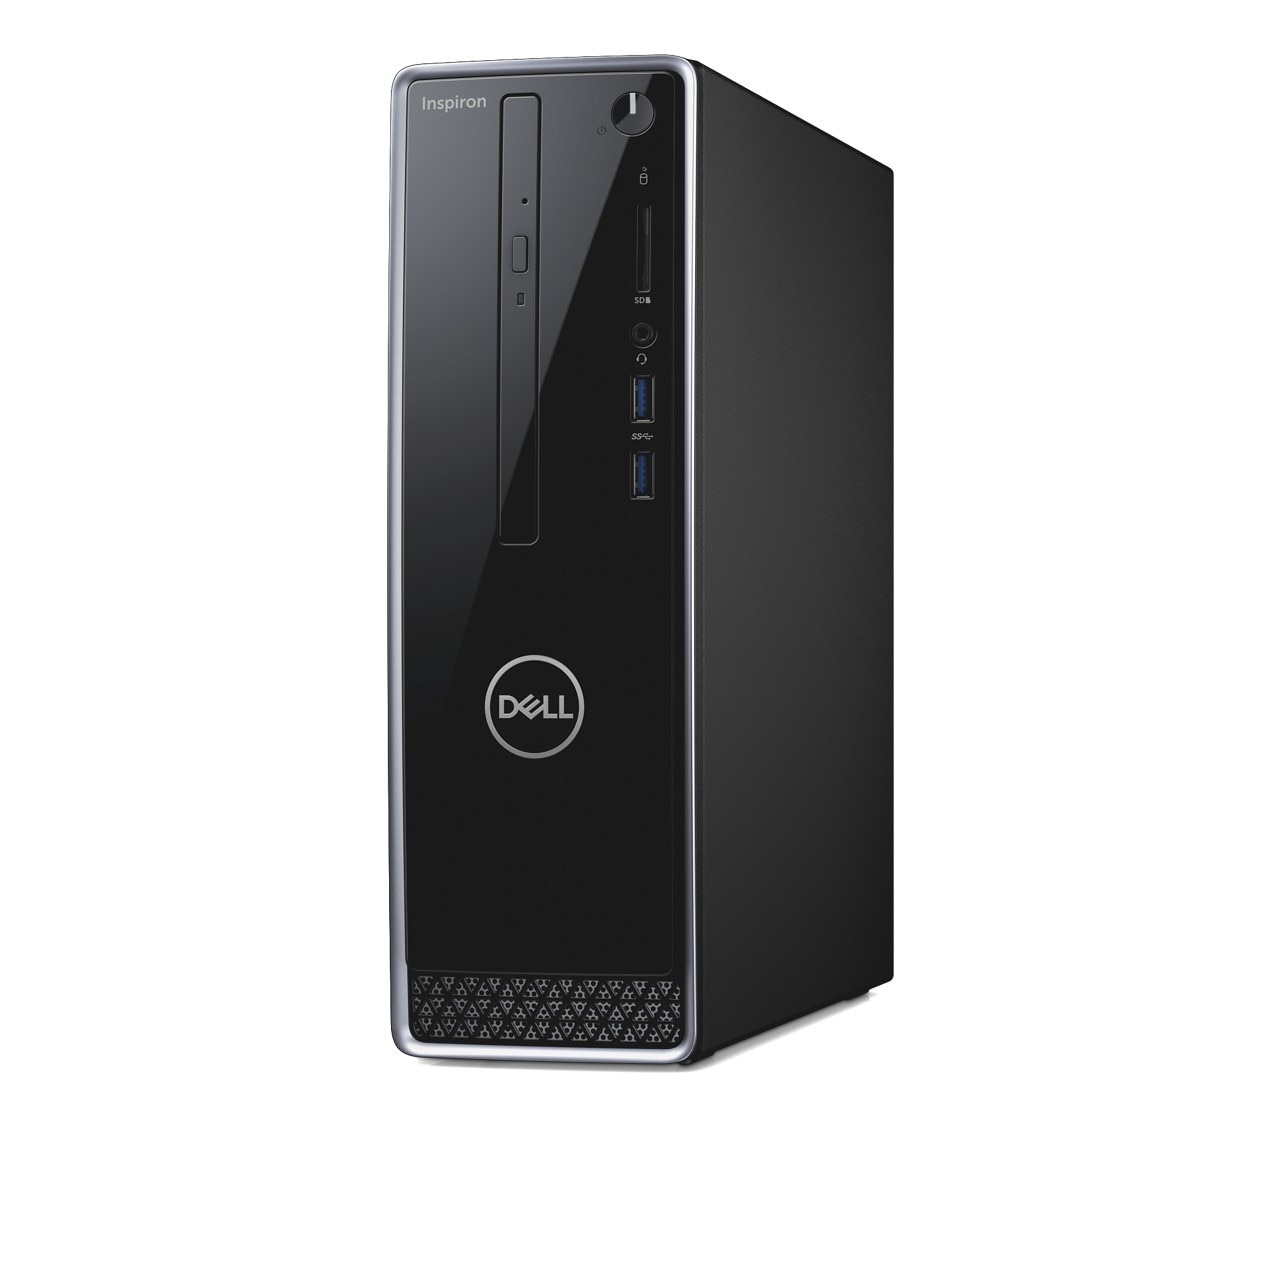 Inspiron 3470 Desktop